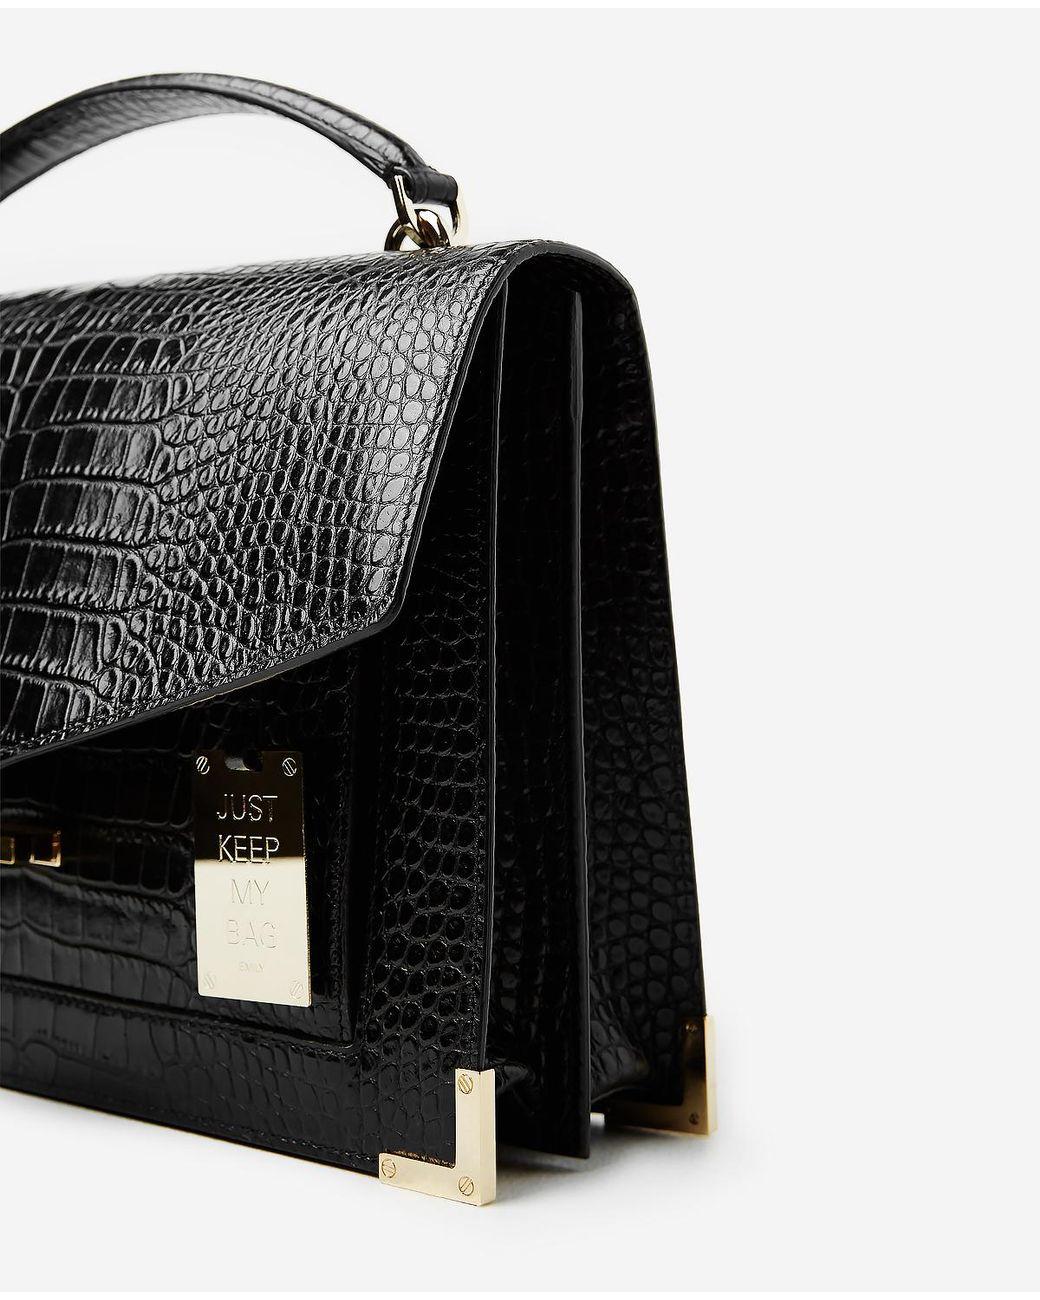 d2a6e3a8e9e4 The Kooples Maxi Emily Bag In Black Mock Croc in Black - Lyst